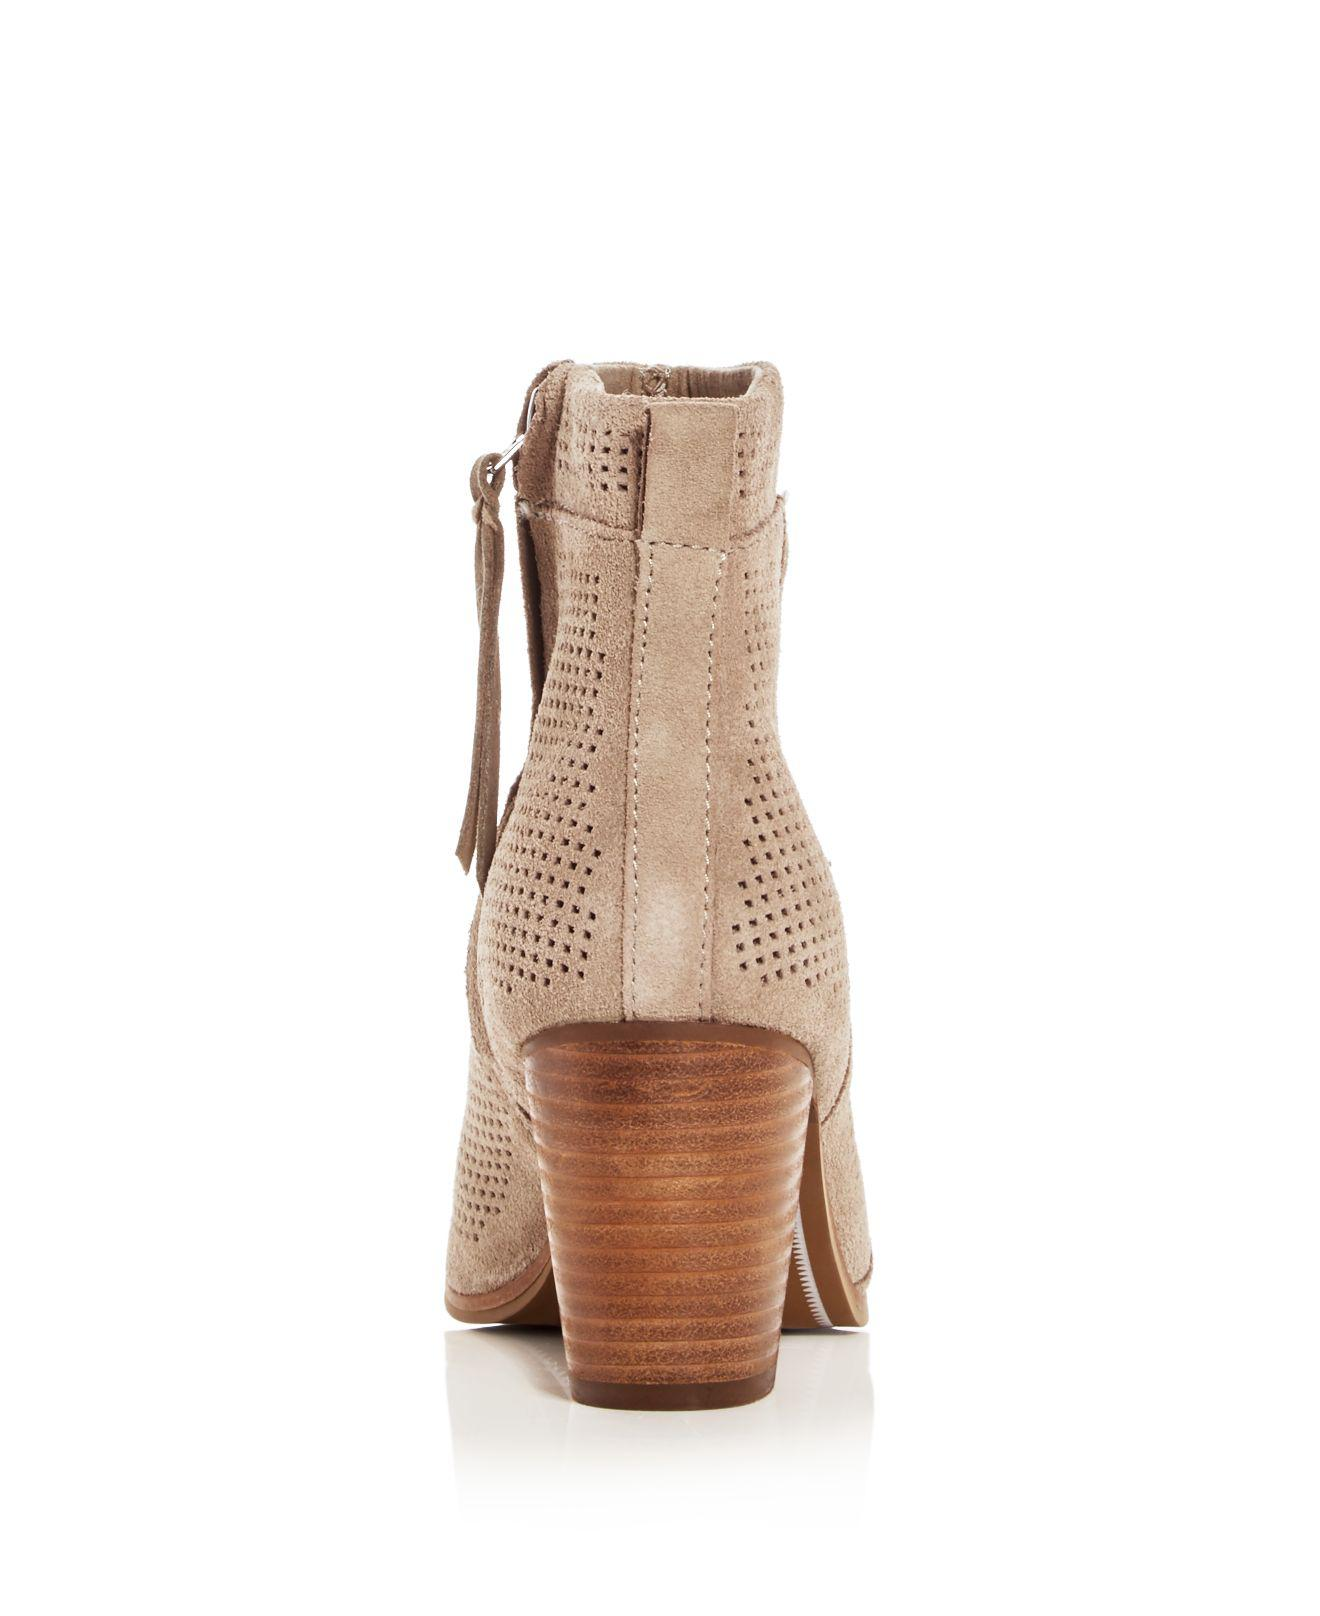 Lyst Toms Women S Lunata Perforated High Heel Booties In